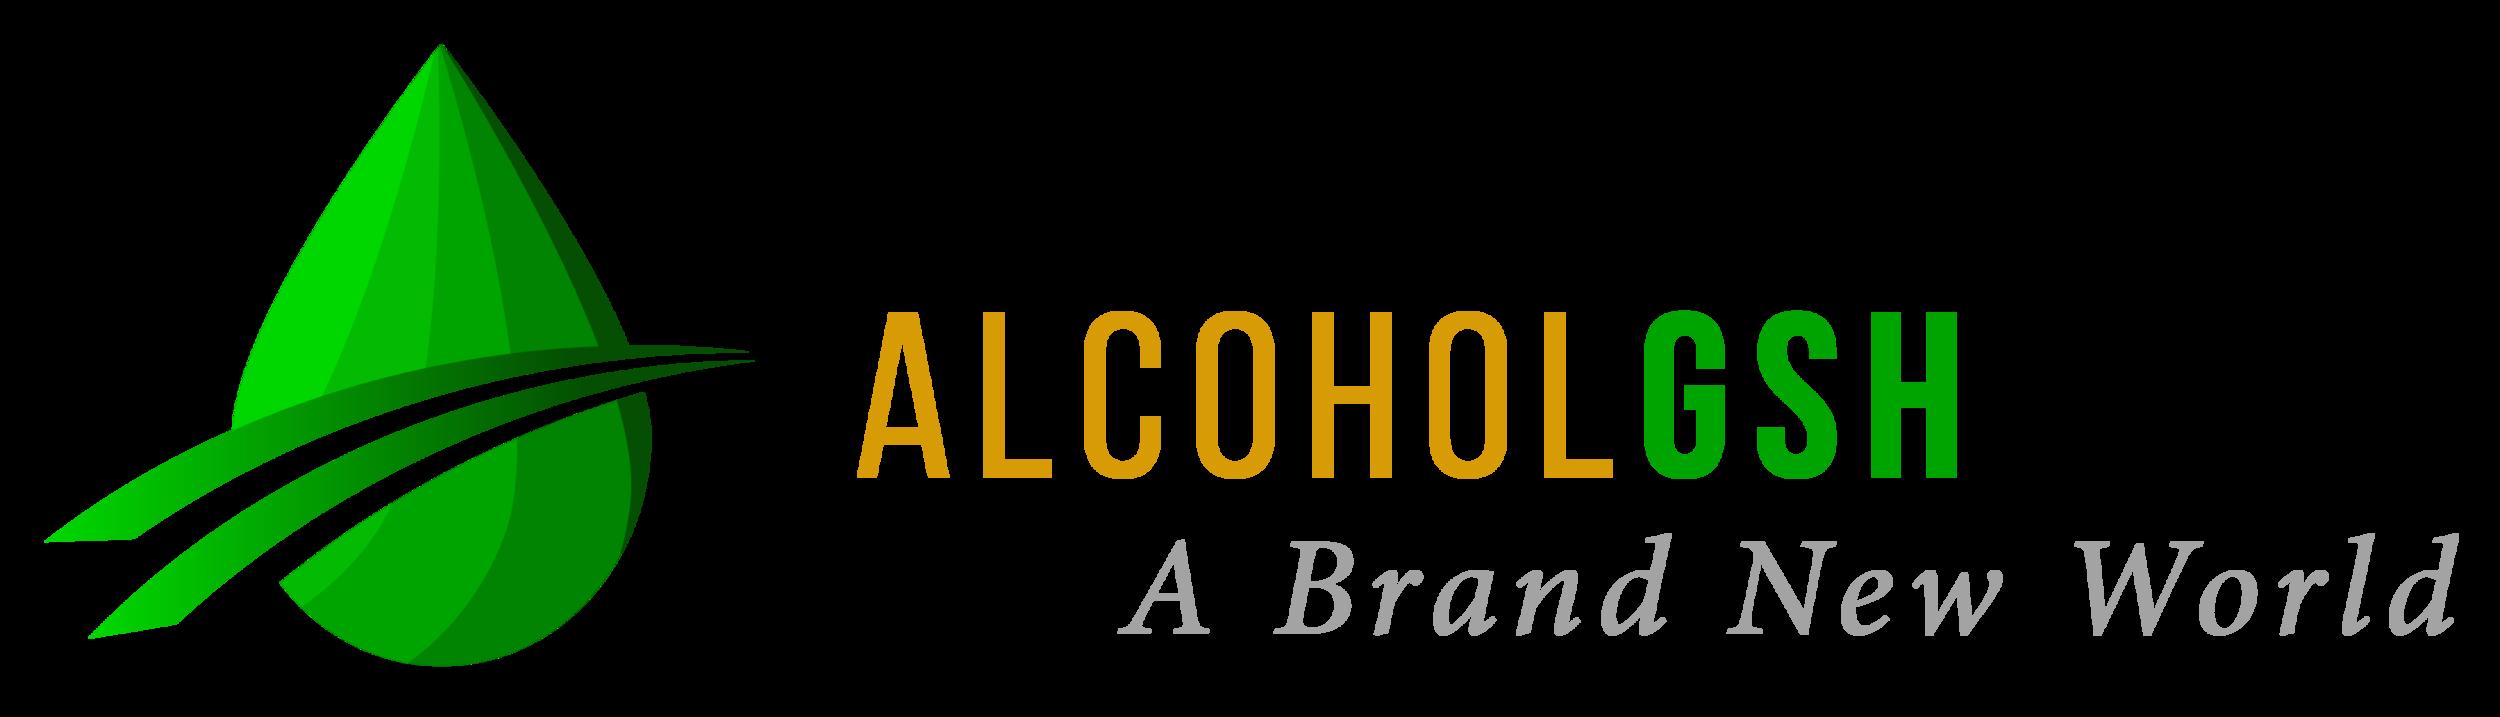 AlcoholGSH_horizontal_wtag_color.png